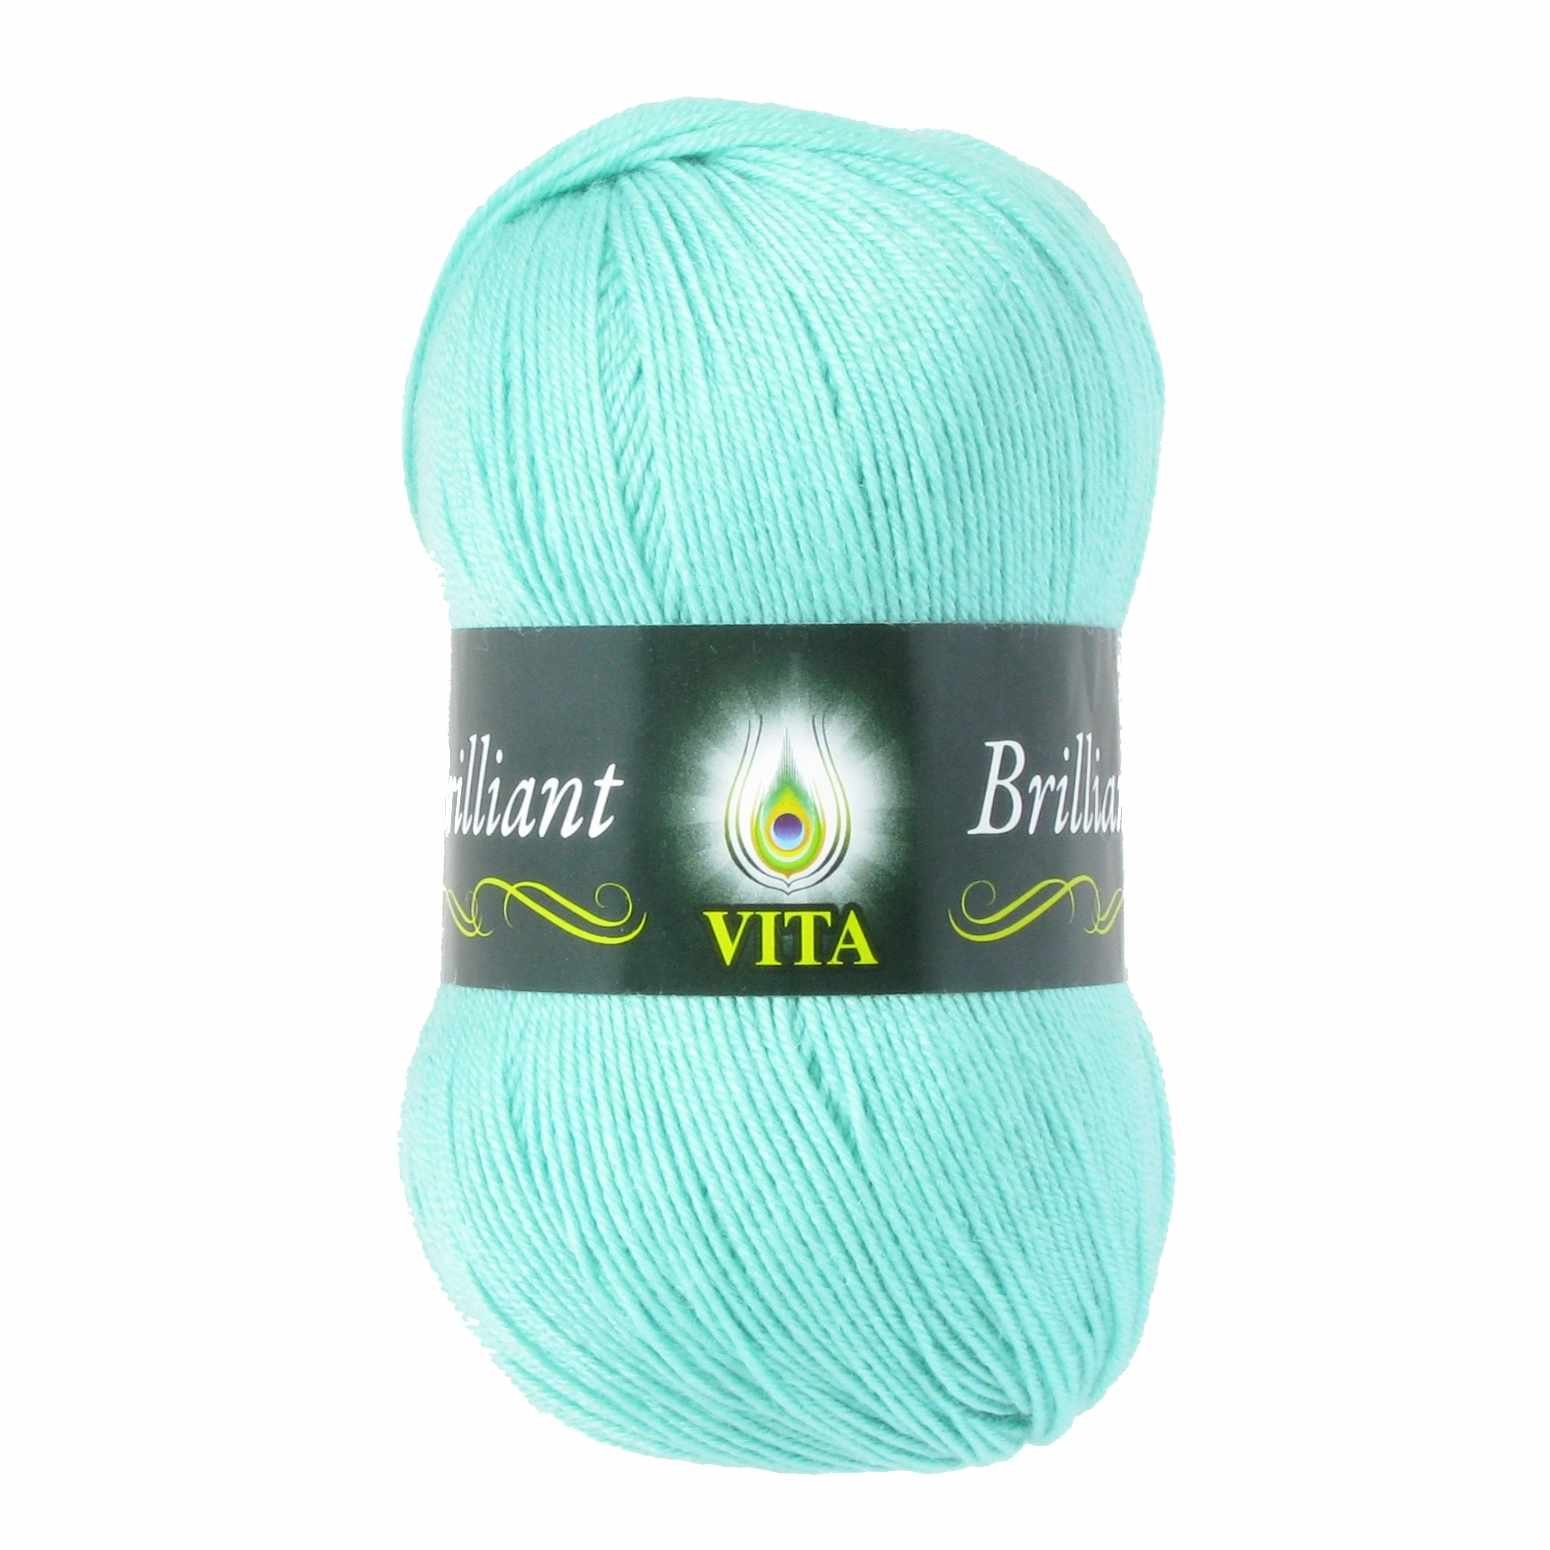 Пряжа VITA Brilliant Цвет.4992 Светло-зеленая  бирюза